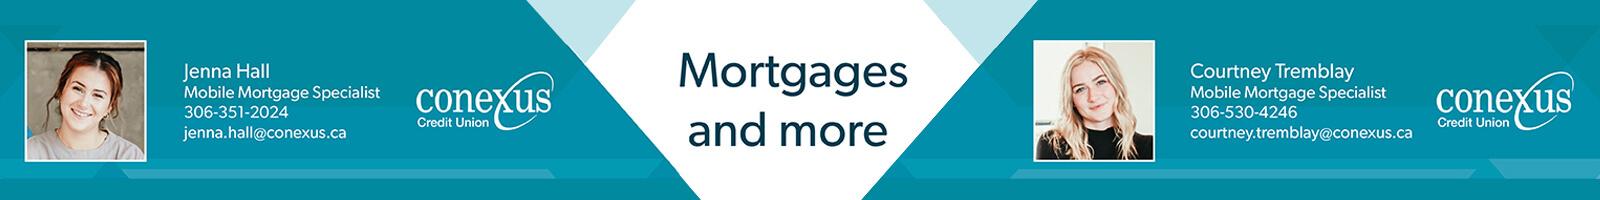 Conexus Mobile Mortgage Specialists